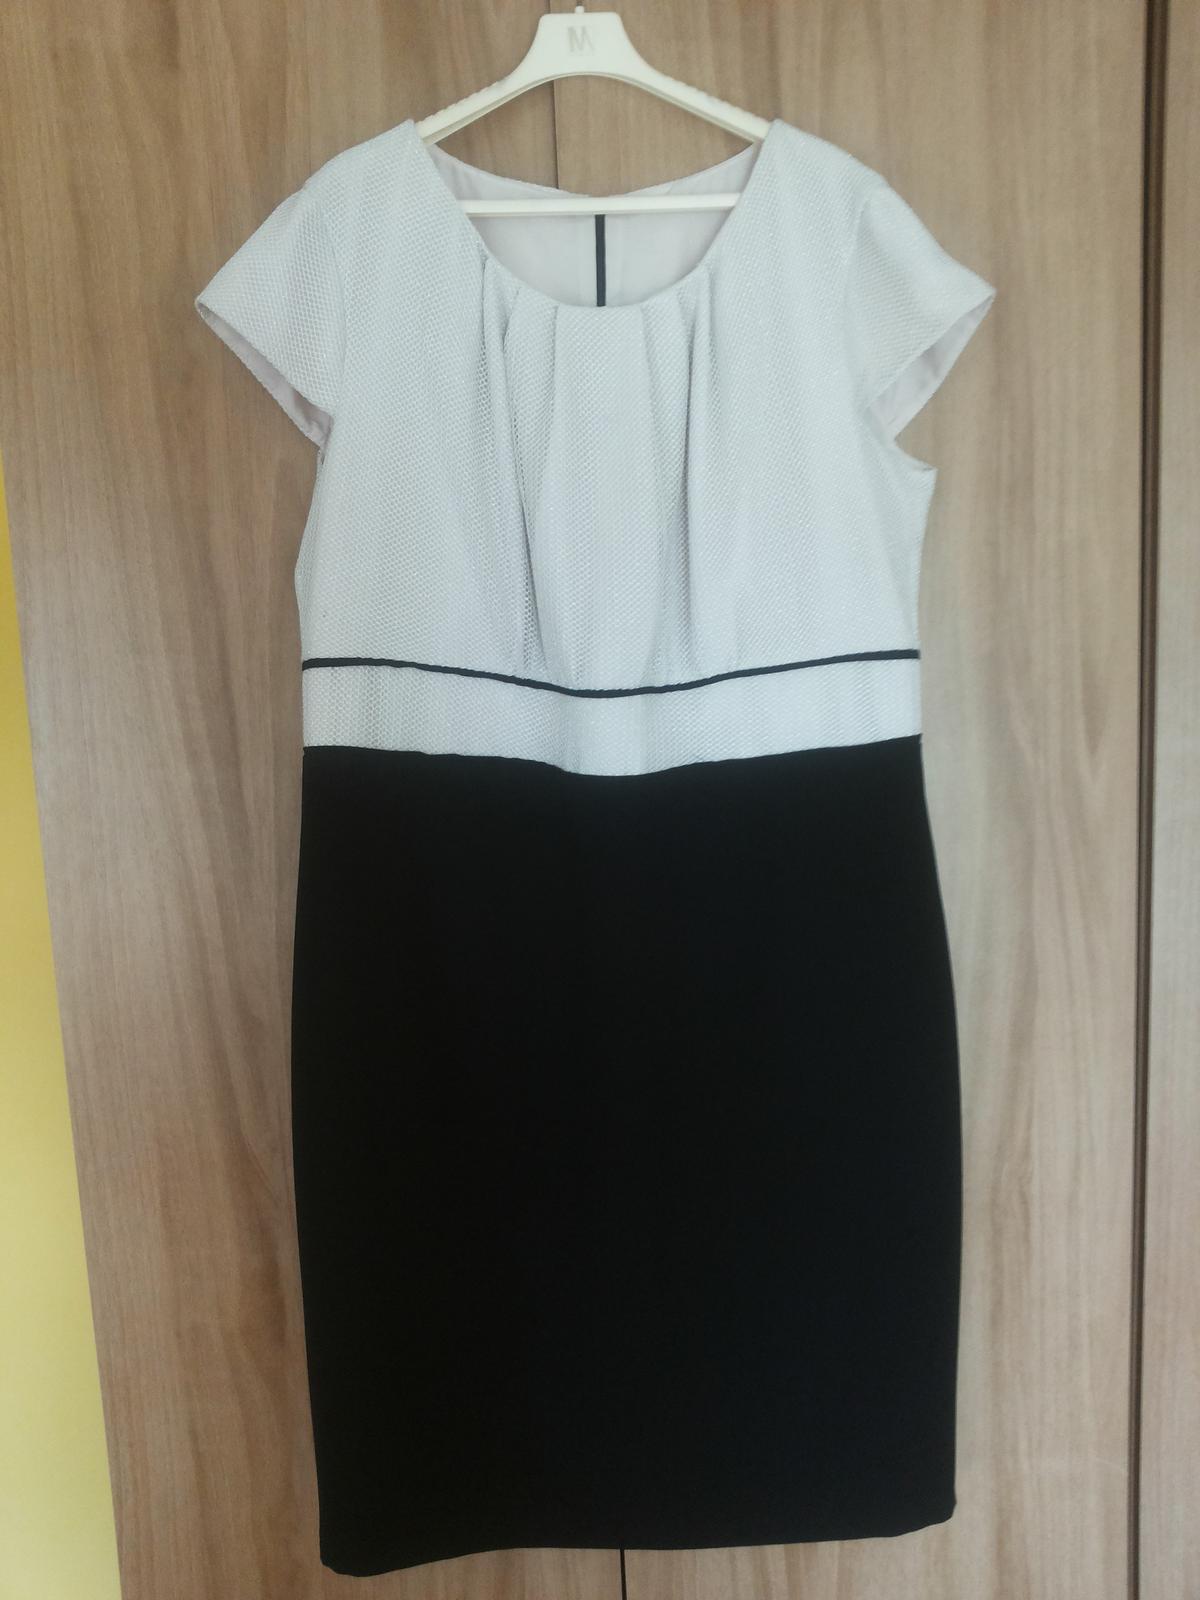 Béžové krátke šaty - Obrázok č. 3